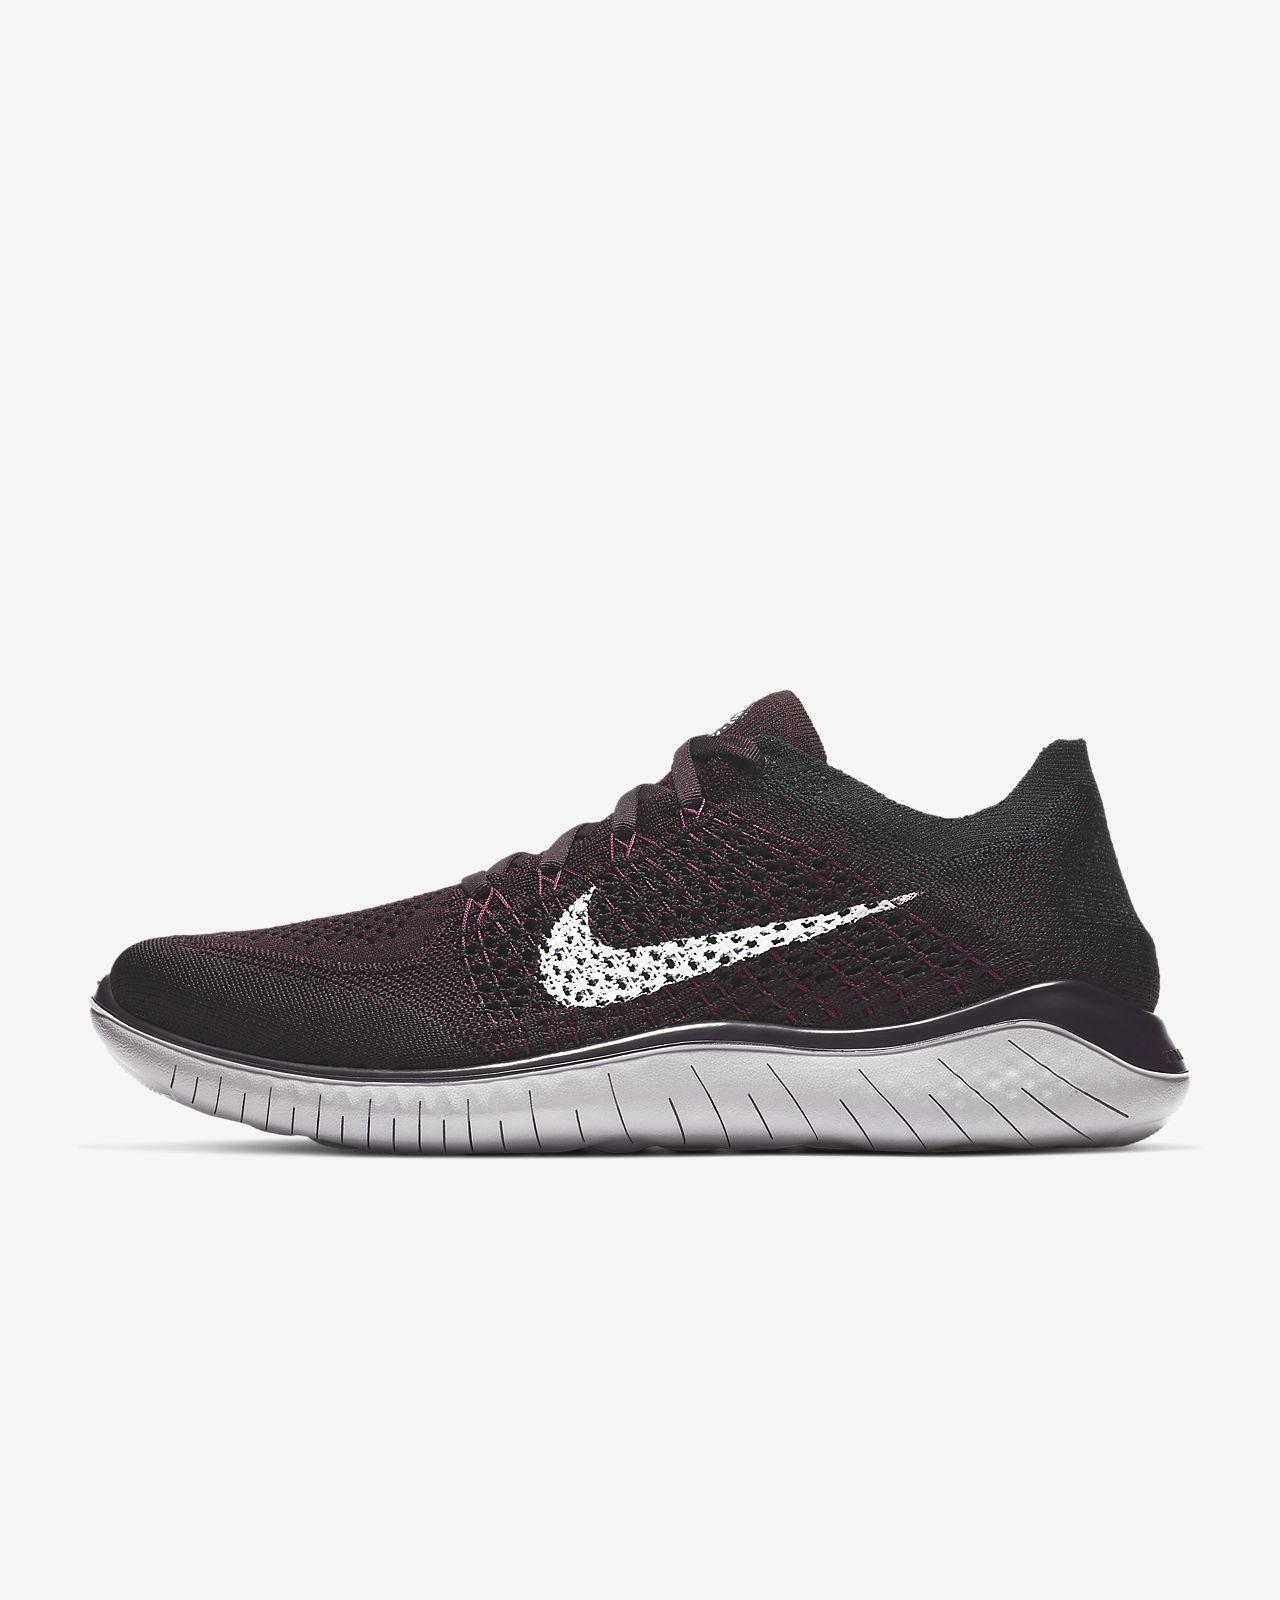 Mx Rn Hombre Running Free 2018 Calzado Flyknit Nike Para De qgnzTP